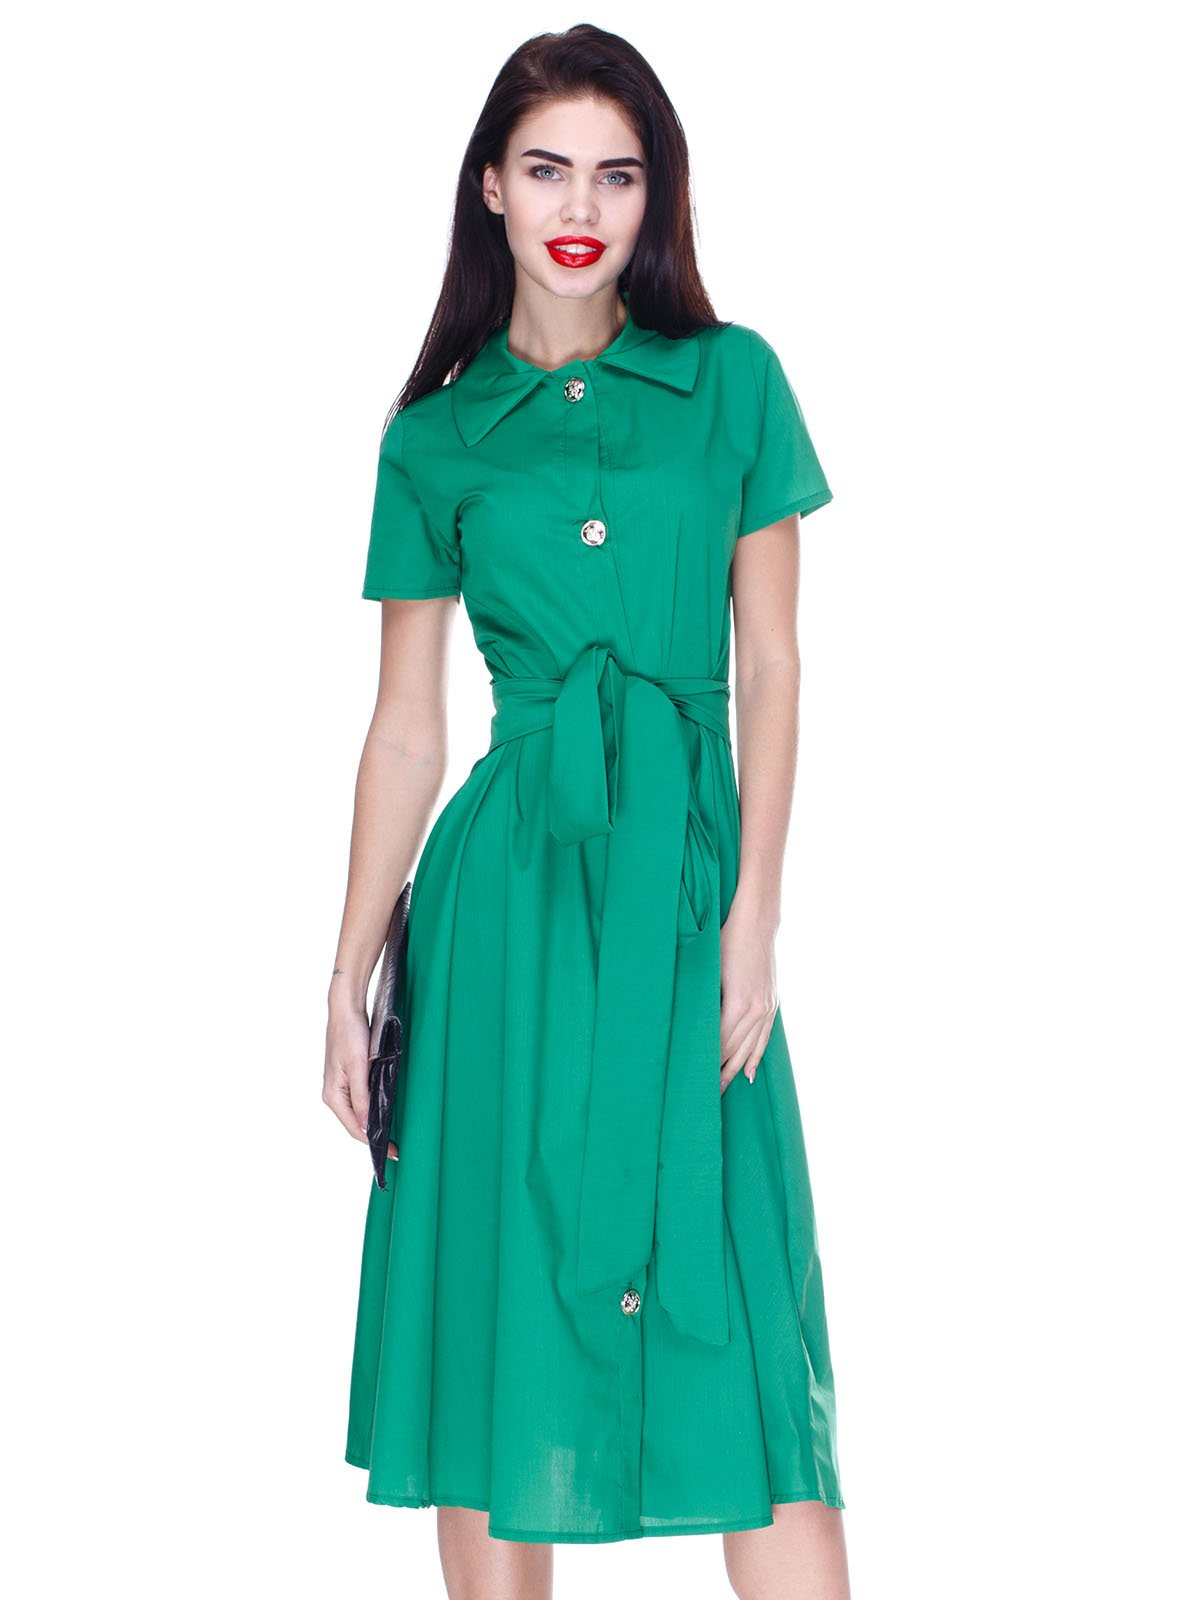 b73d46873e8 Платье-рубашка зеленое — CELEBRITY